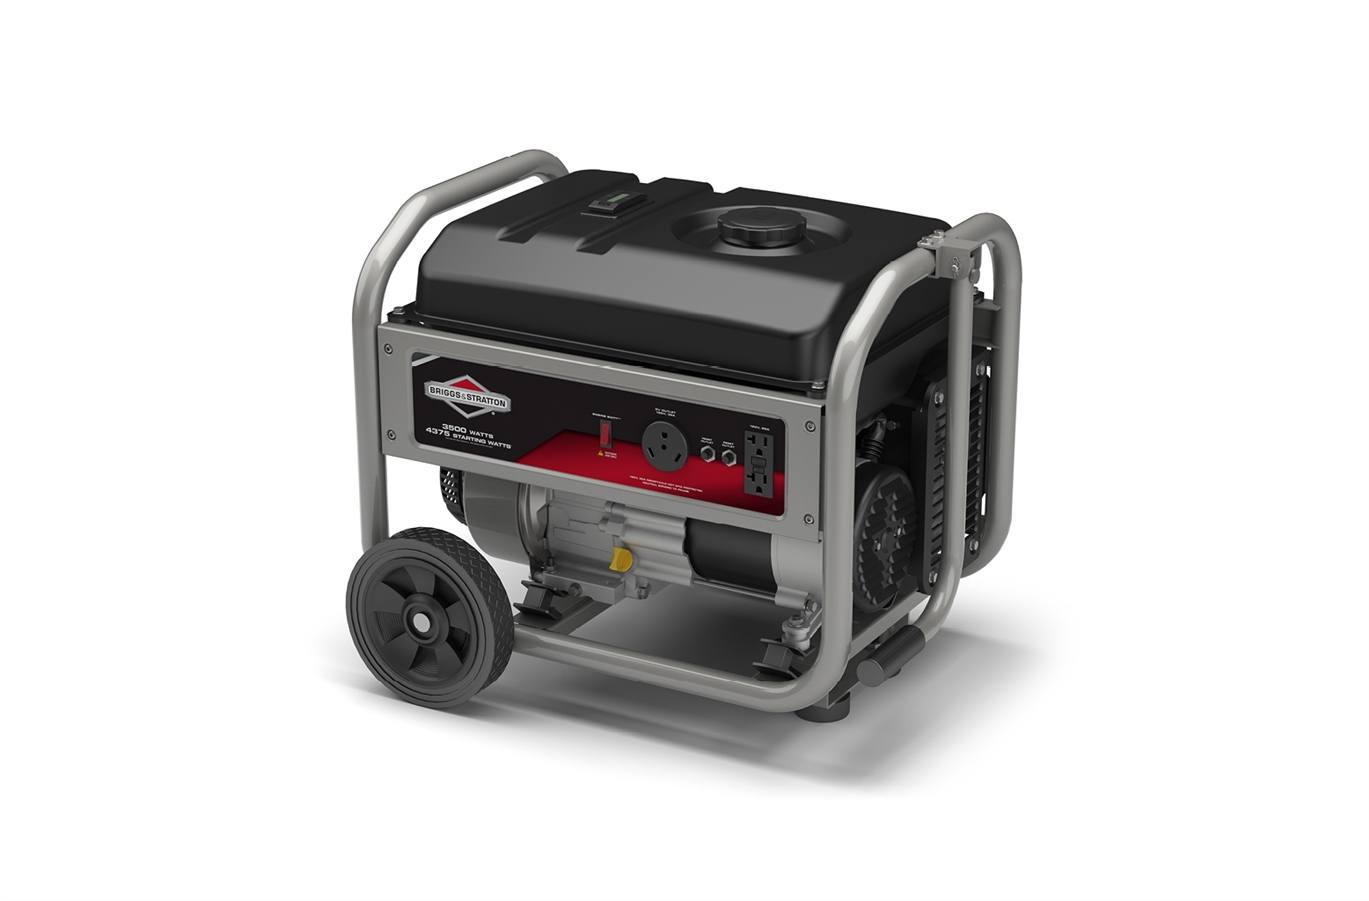 2019 Briggs & Stratton 3500 Watt Portable Generator (030680